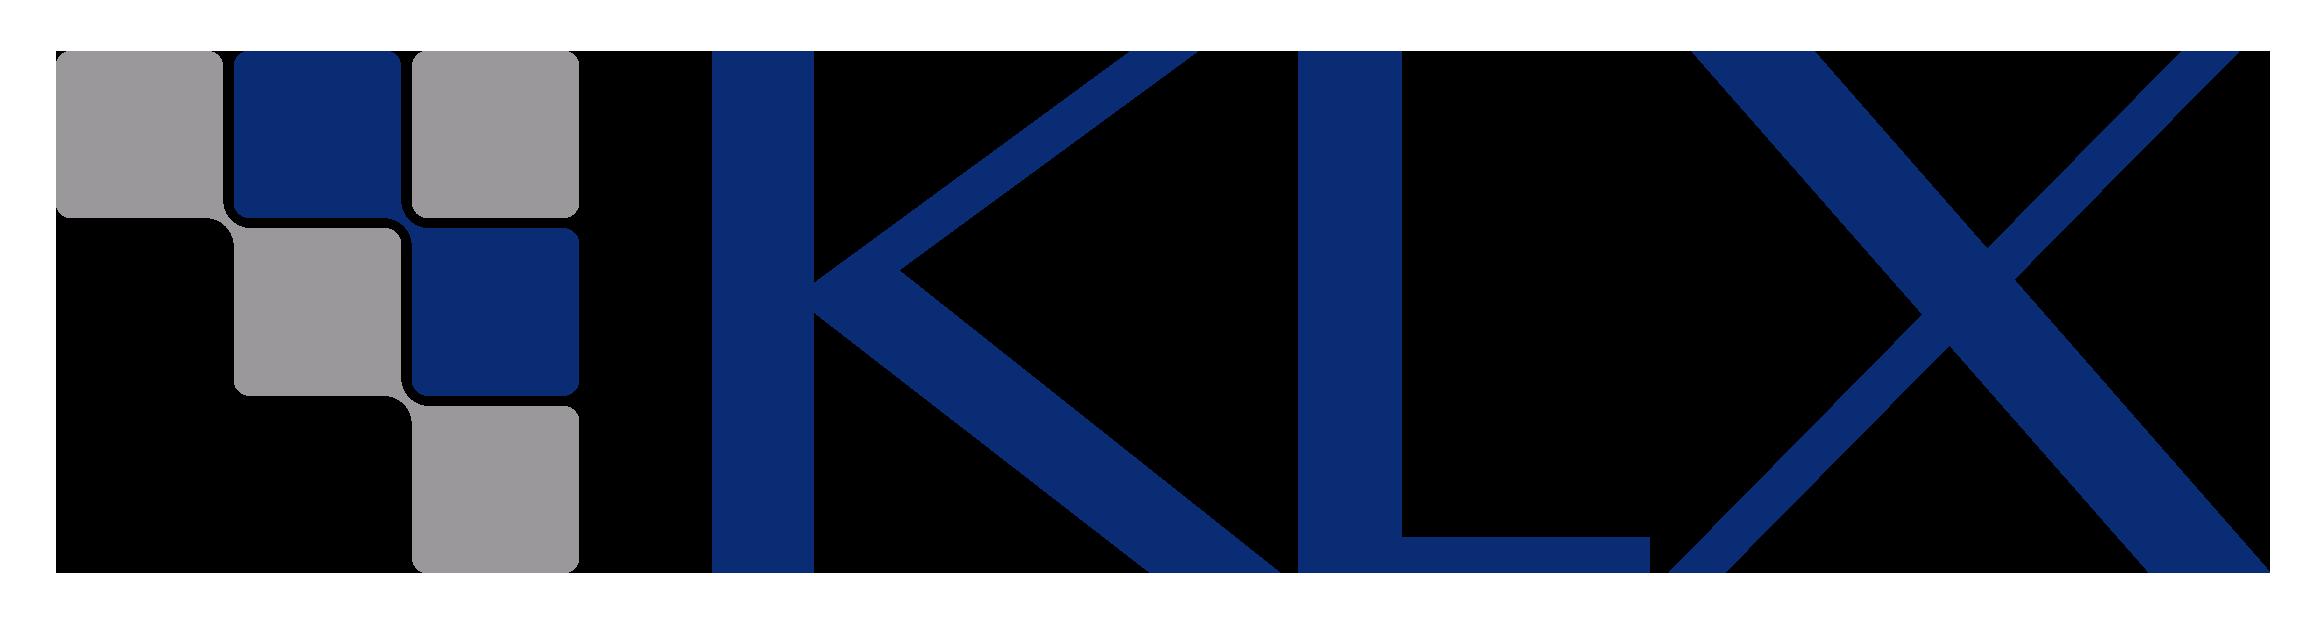 KLX logo